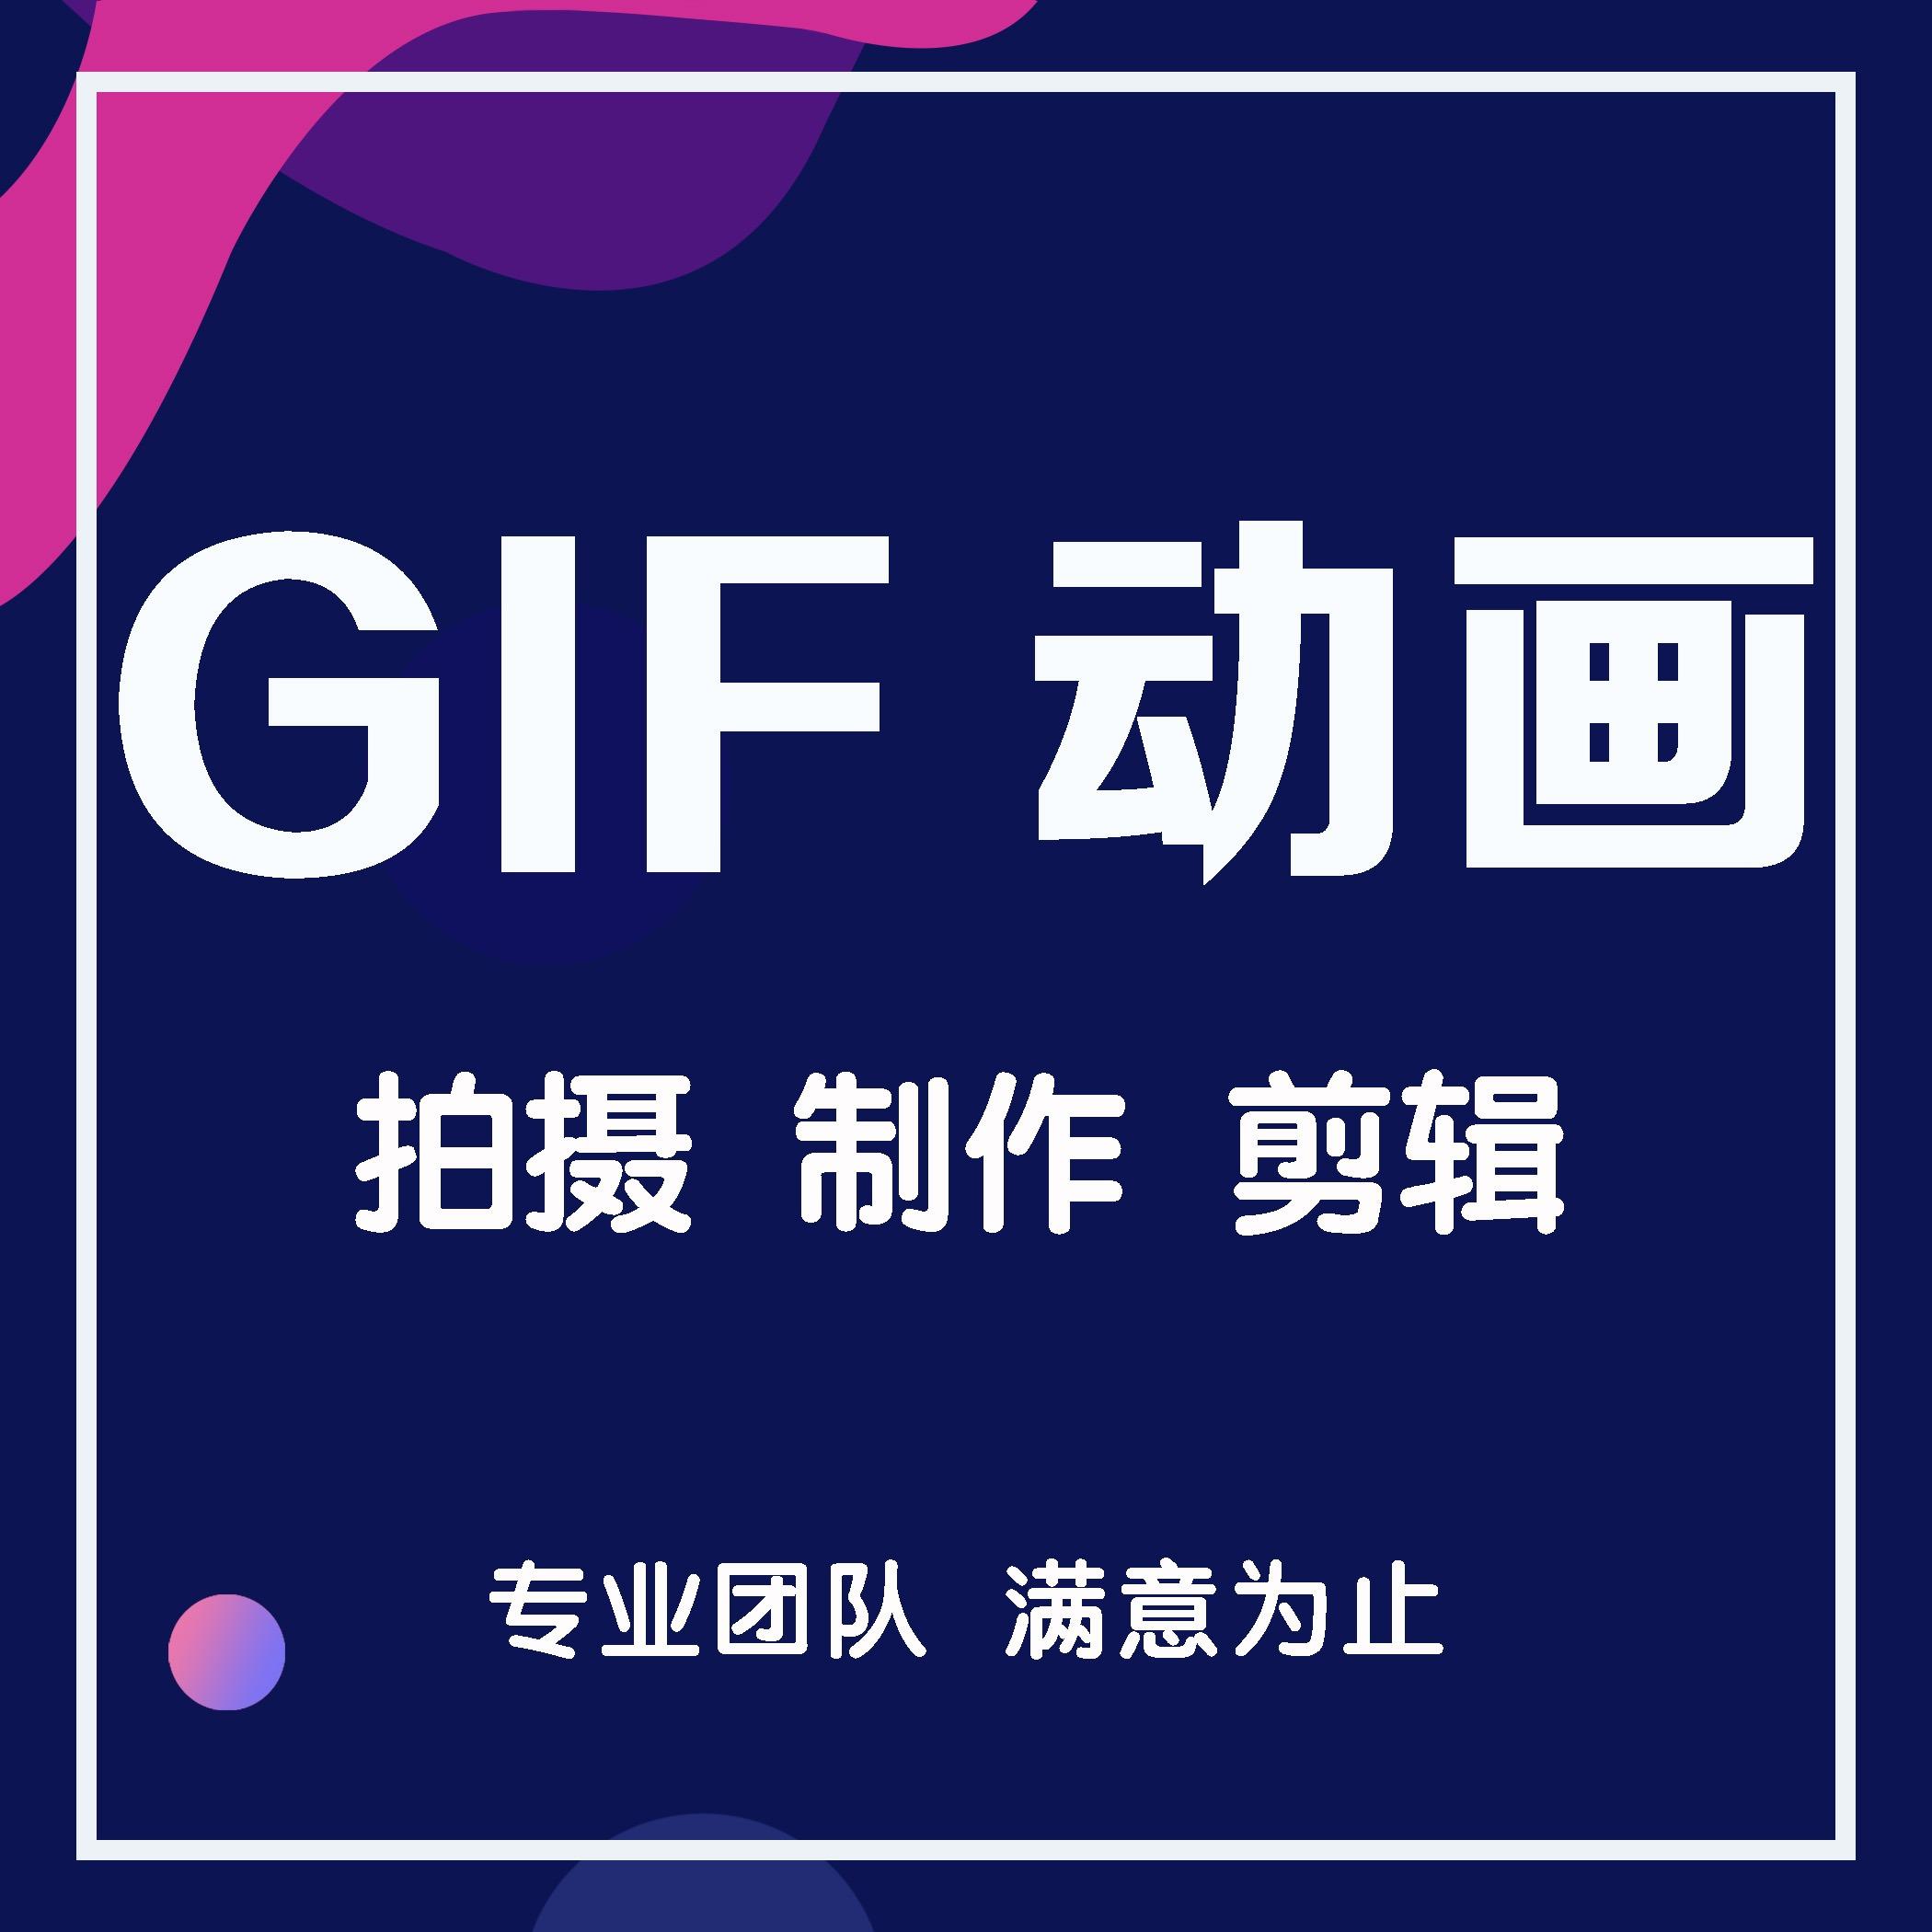 【GIF动画】高清精美GIF动画制作 动态设计保证原创